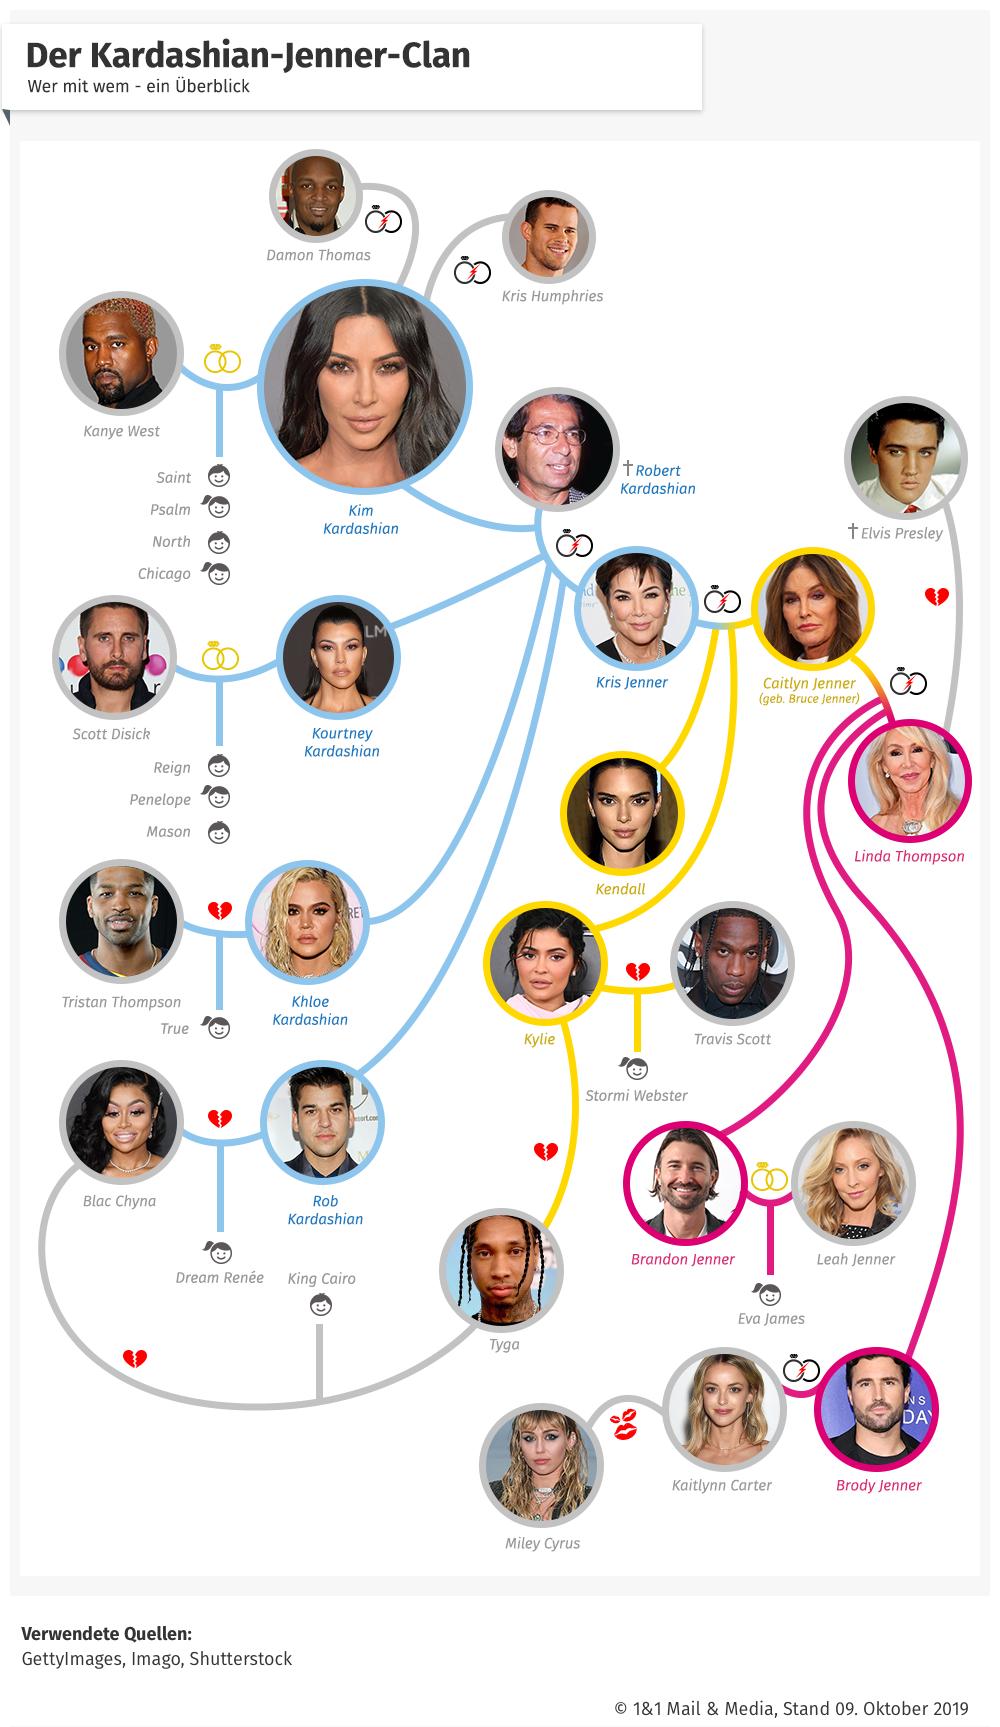 Bild zu Kardashian-Jenner-Clan Stammbaum